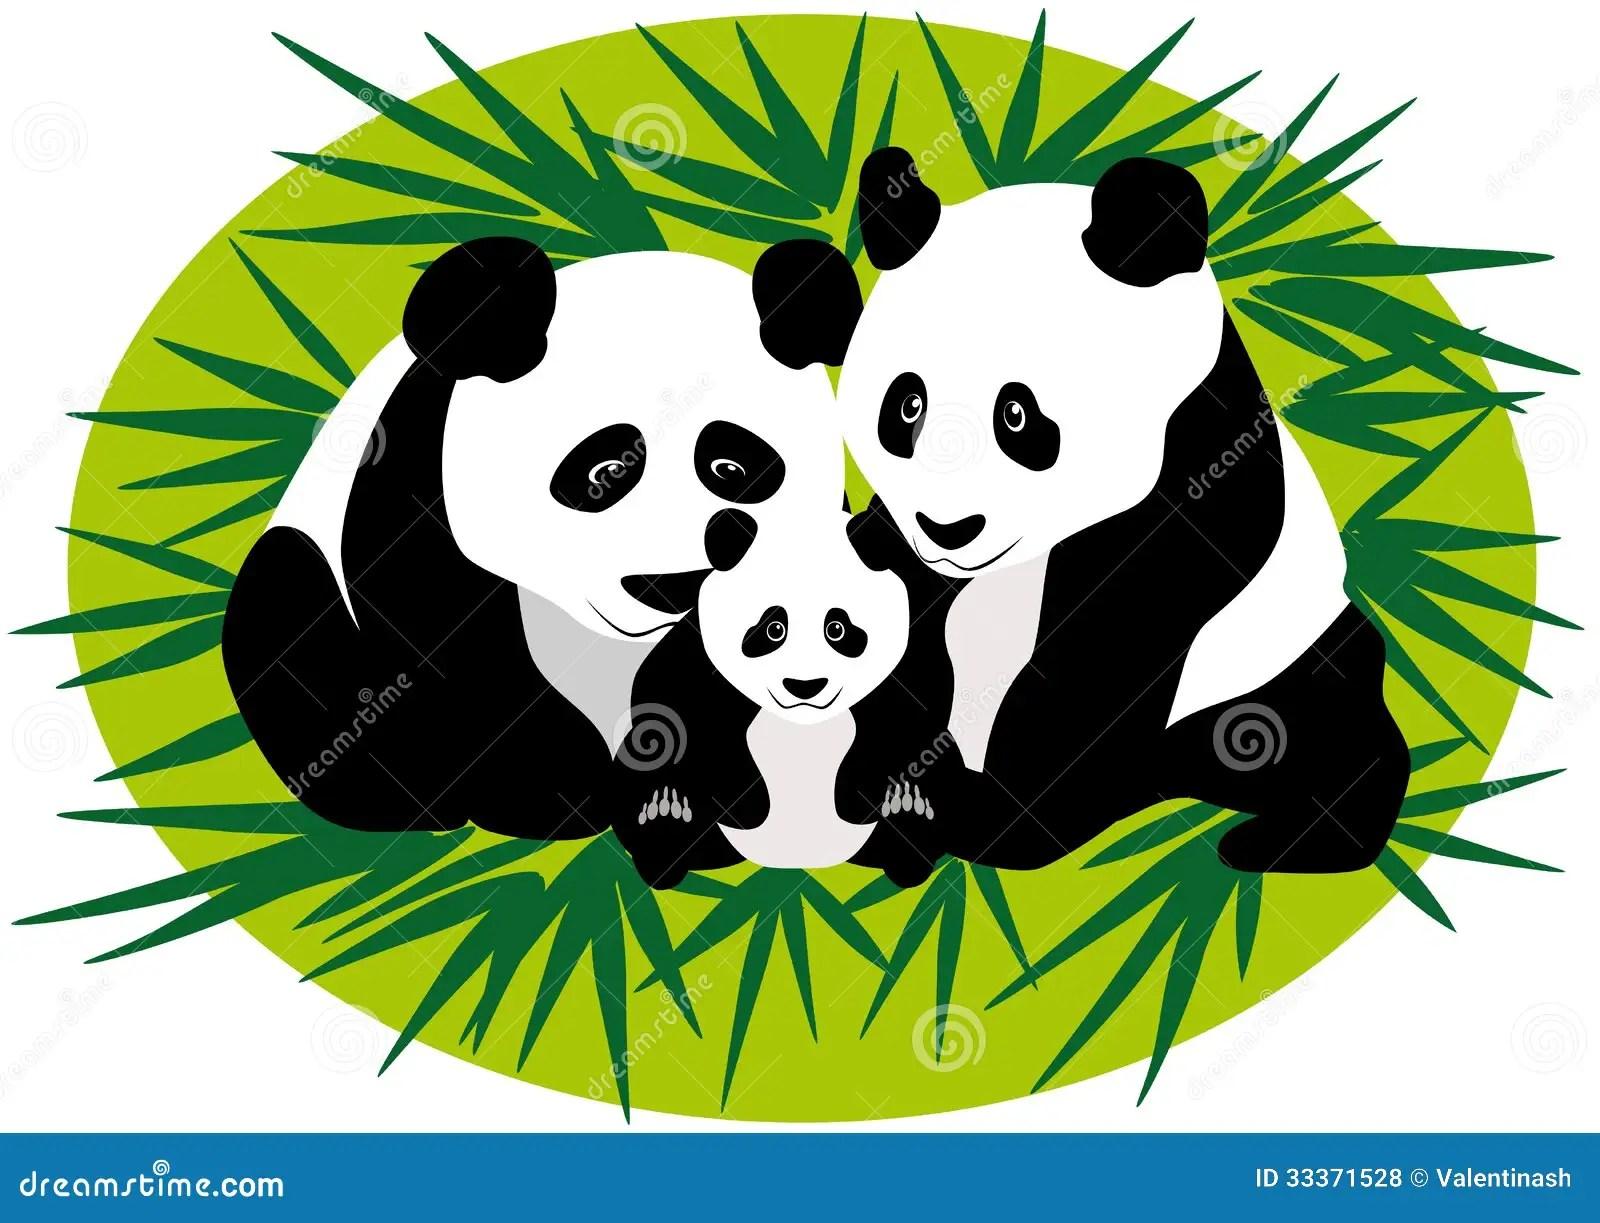 Cute Baby Bears Wallpaper Family Panda Bears Stock Vector Illustration Of Love